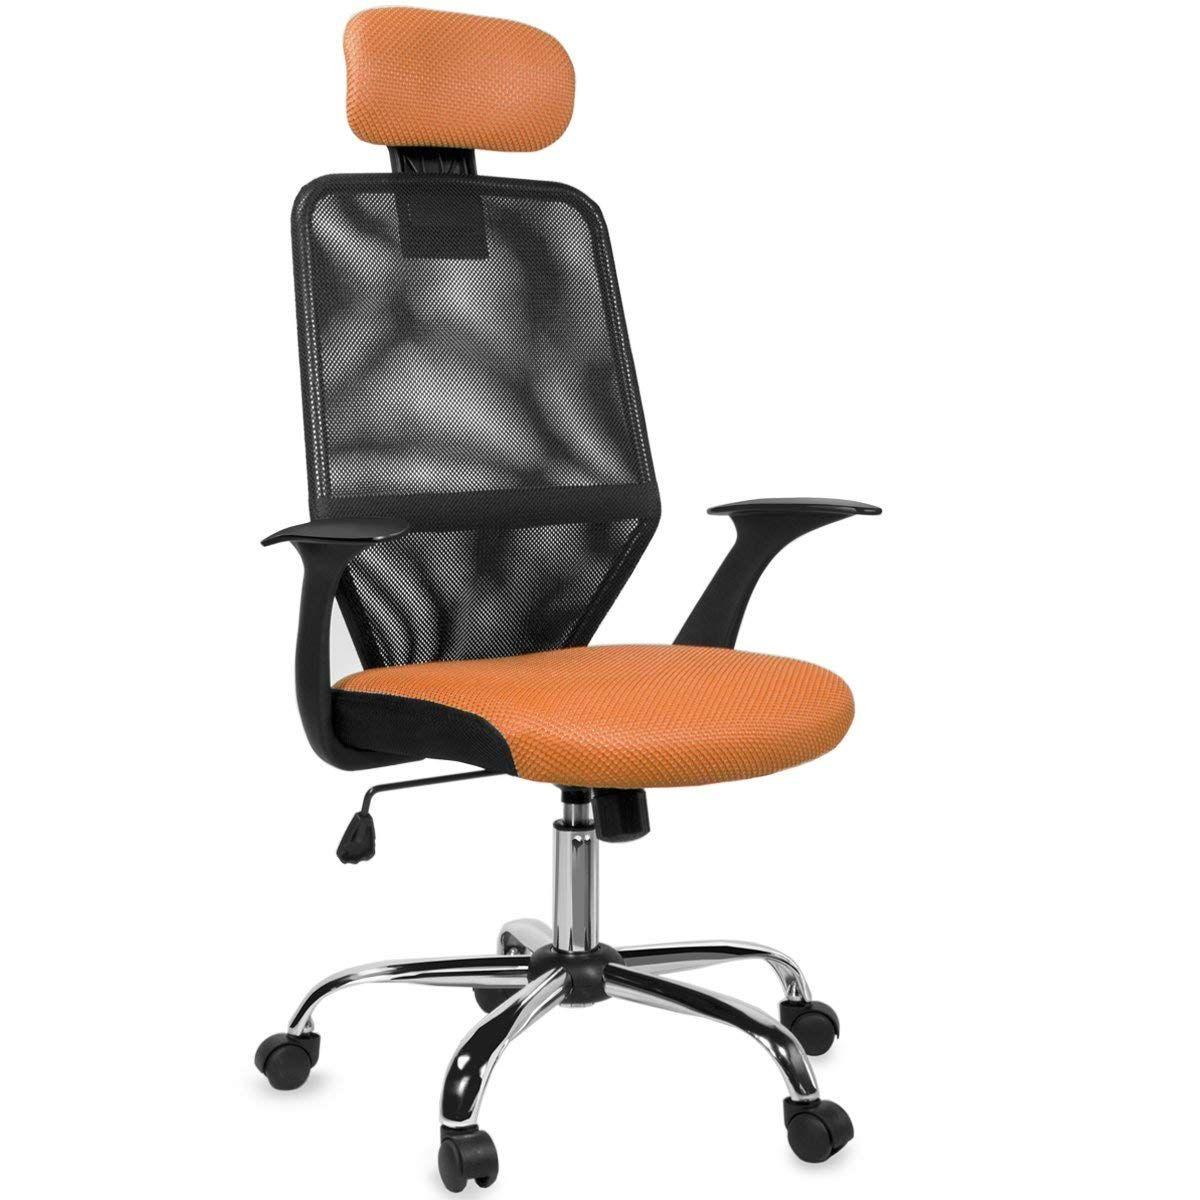 Barton mesh office desk chair w headrest orange